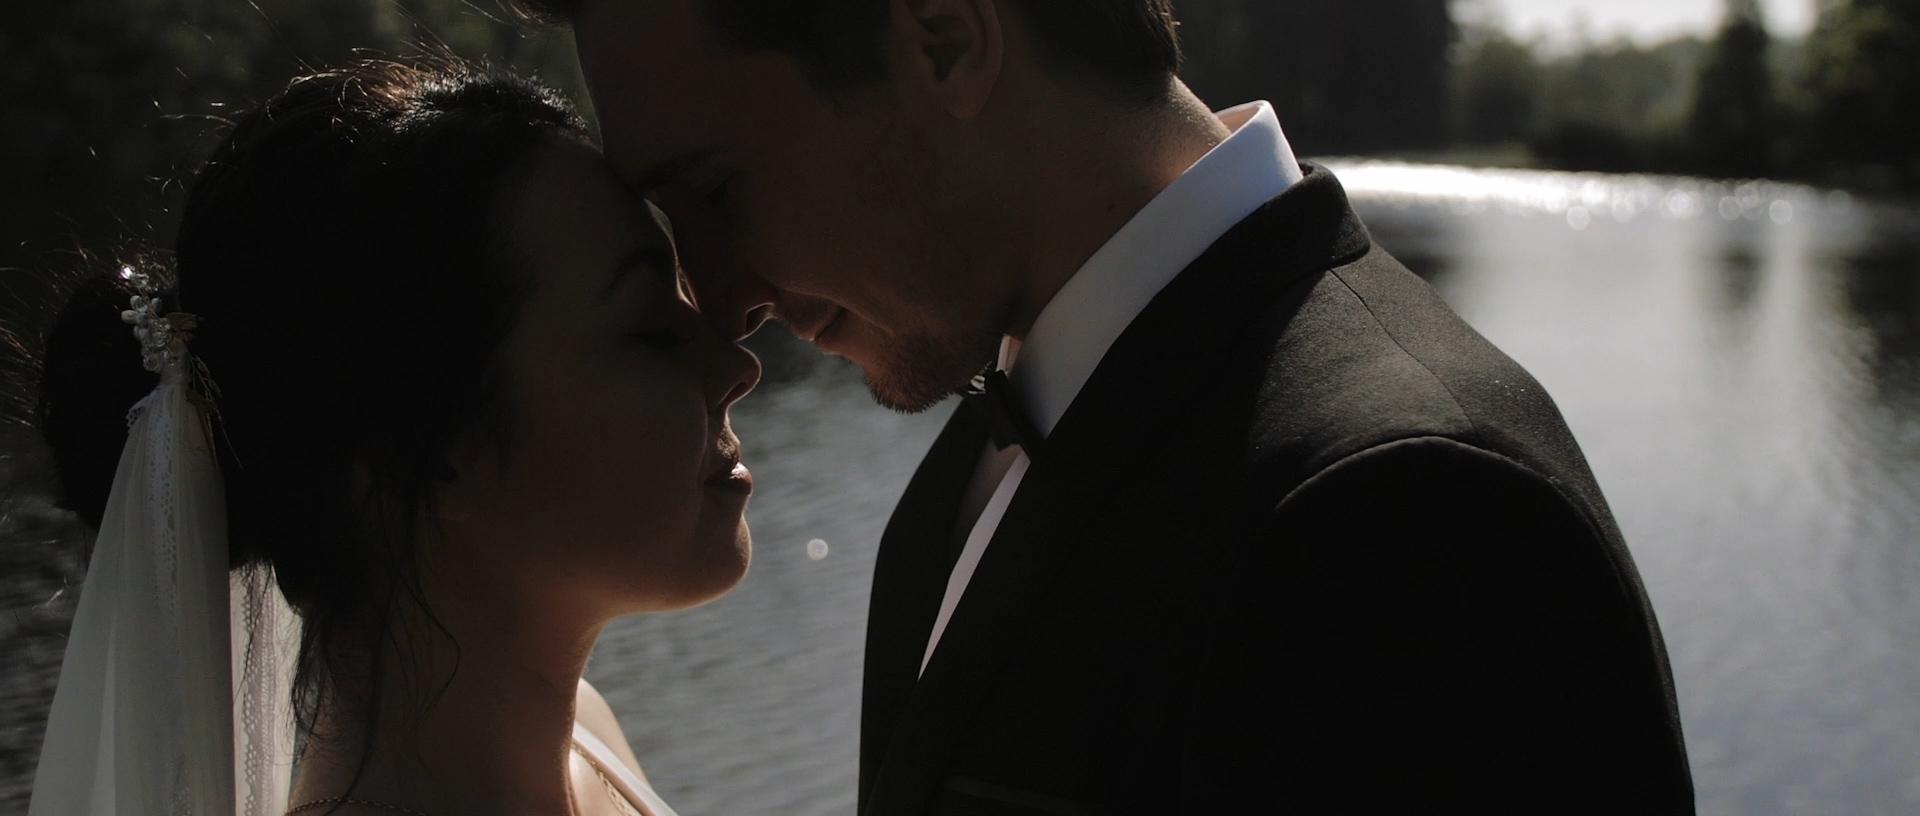 perth-wedding-videographer_LL_07.jpg